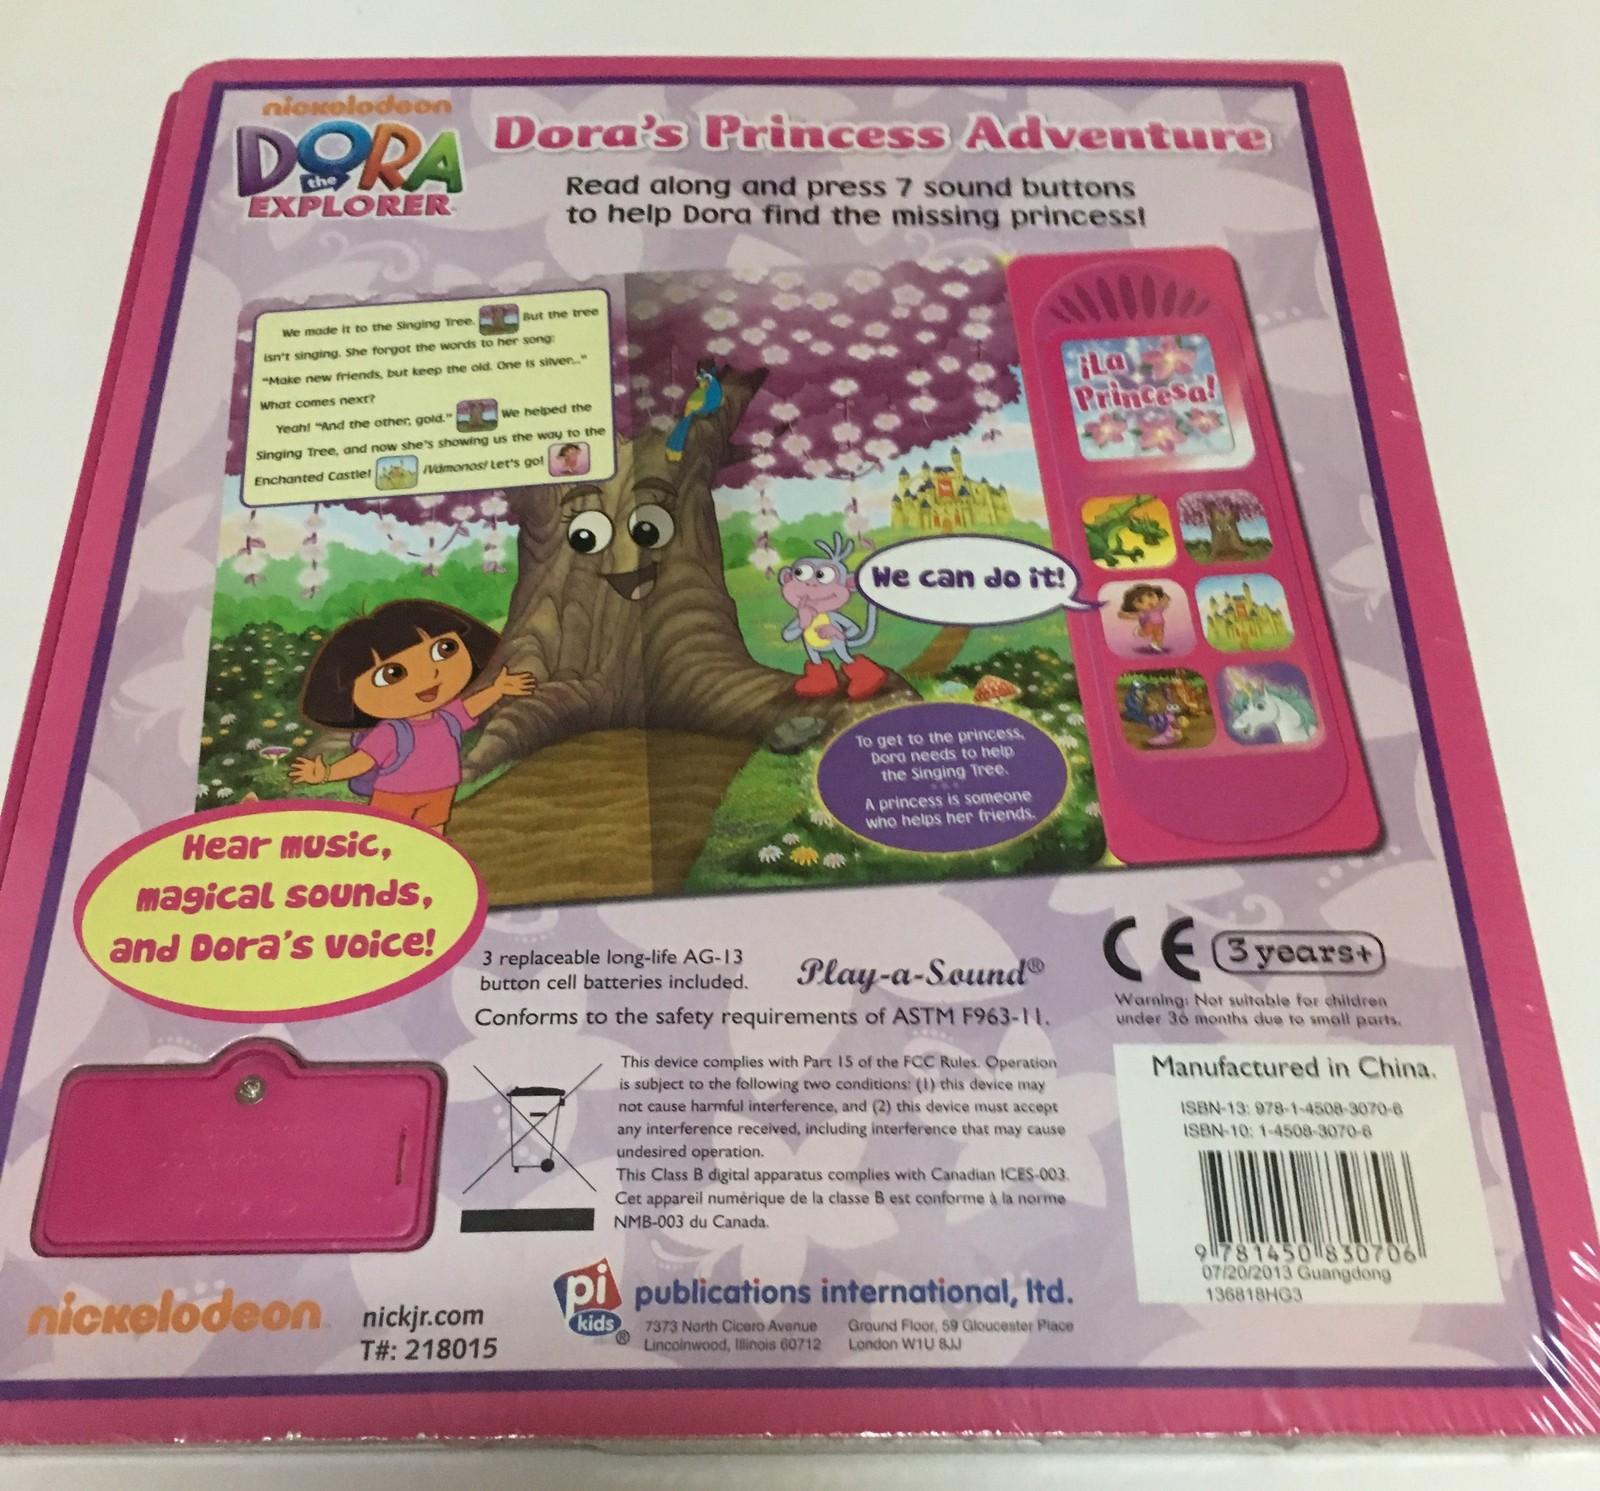 Nickelodeon Dora's Princess Adventure Activity Book 3+